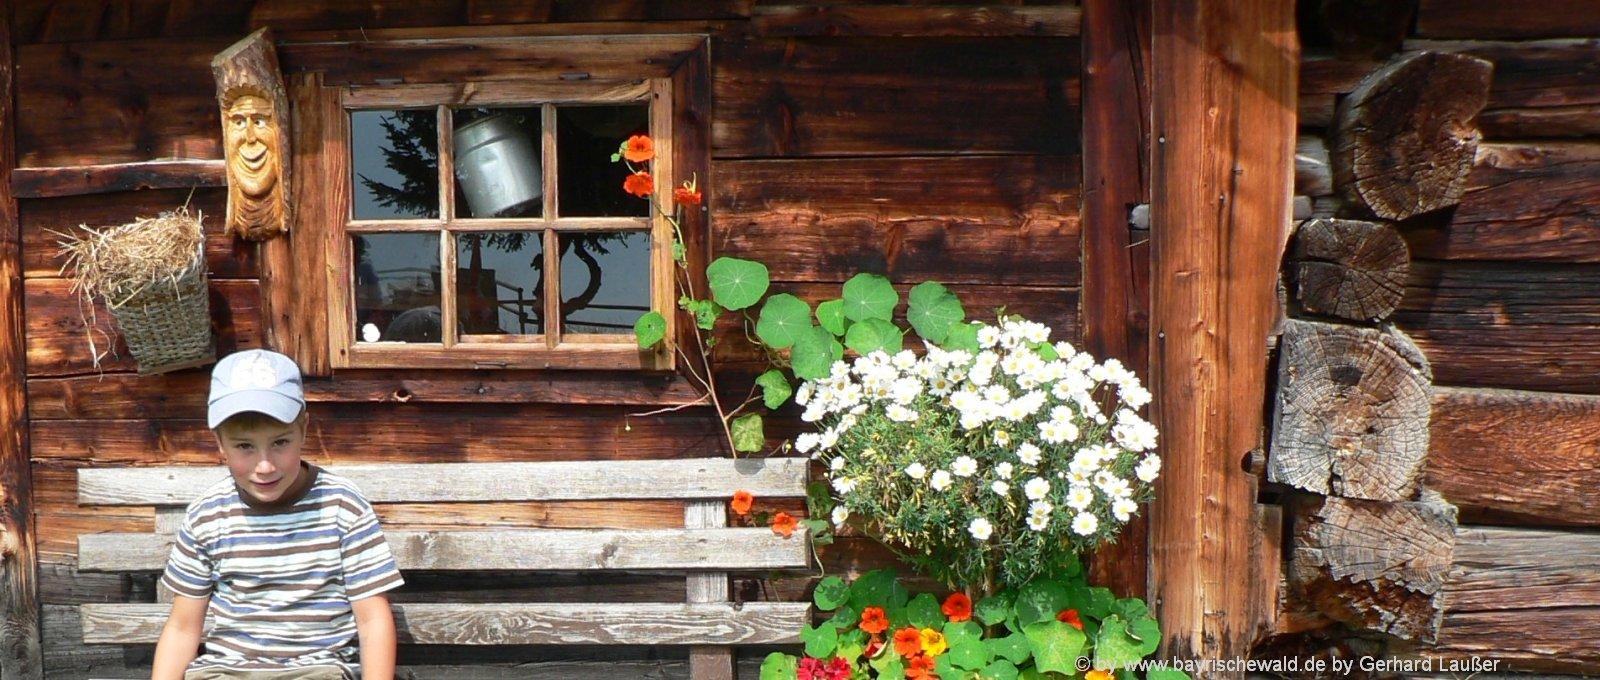 hüttenurlaub-bayerischer-wald-almhuette-berghütten-blockhaus